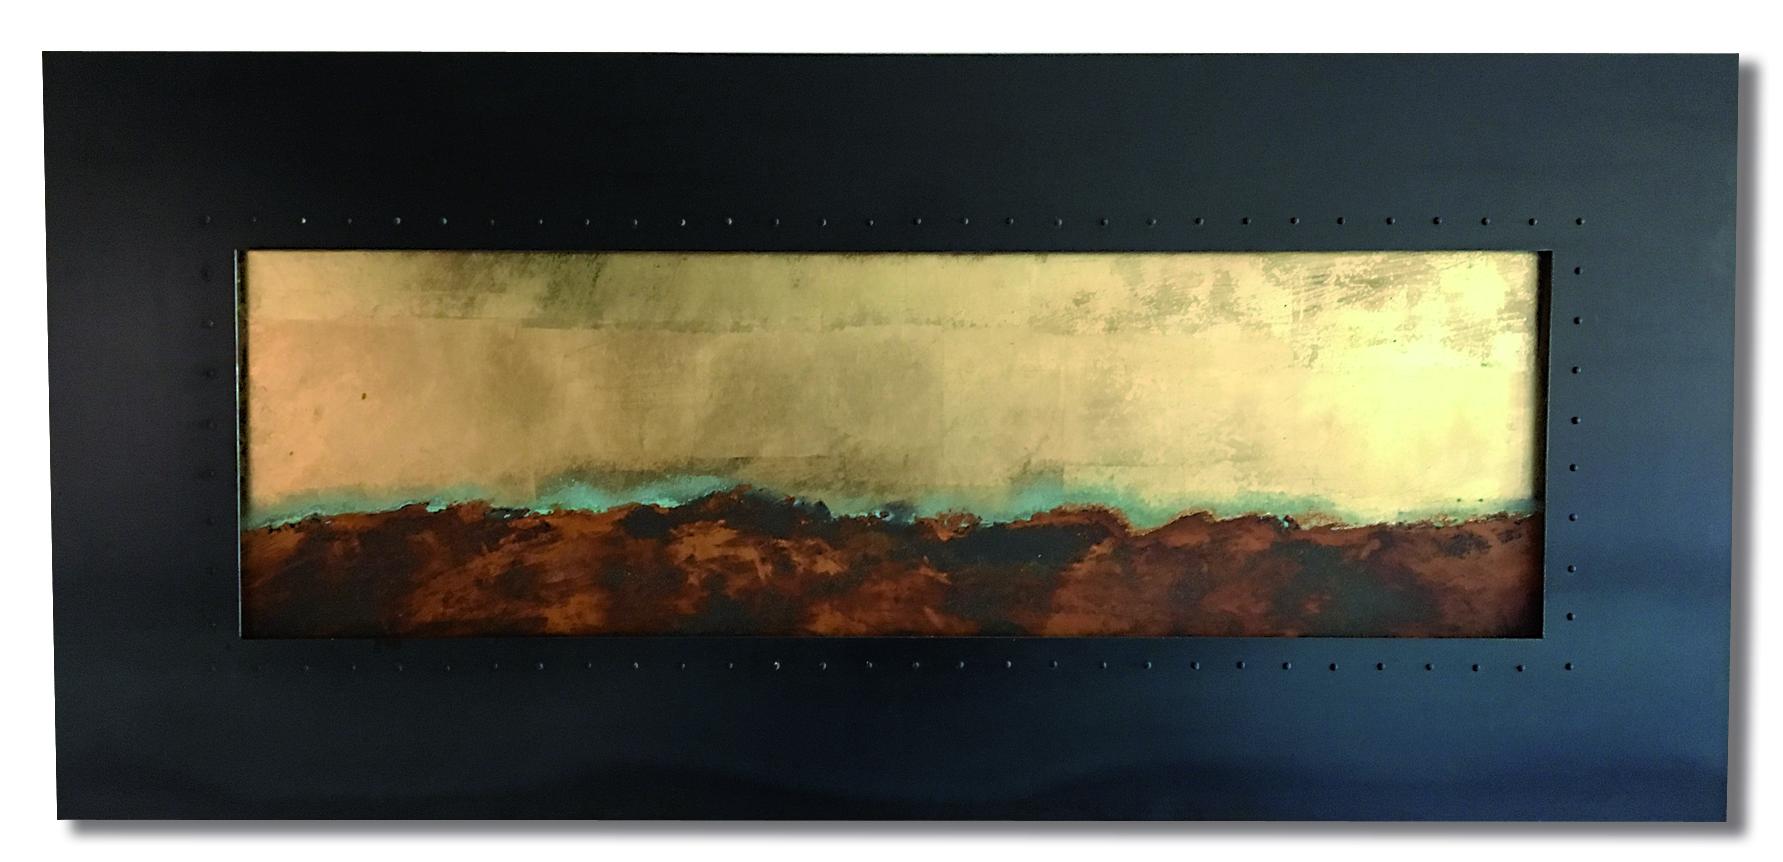 Stahlbild Gold Oxidation_6061